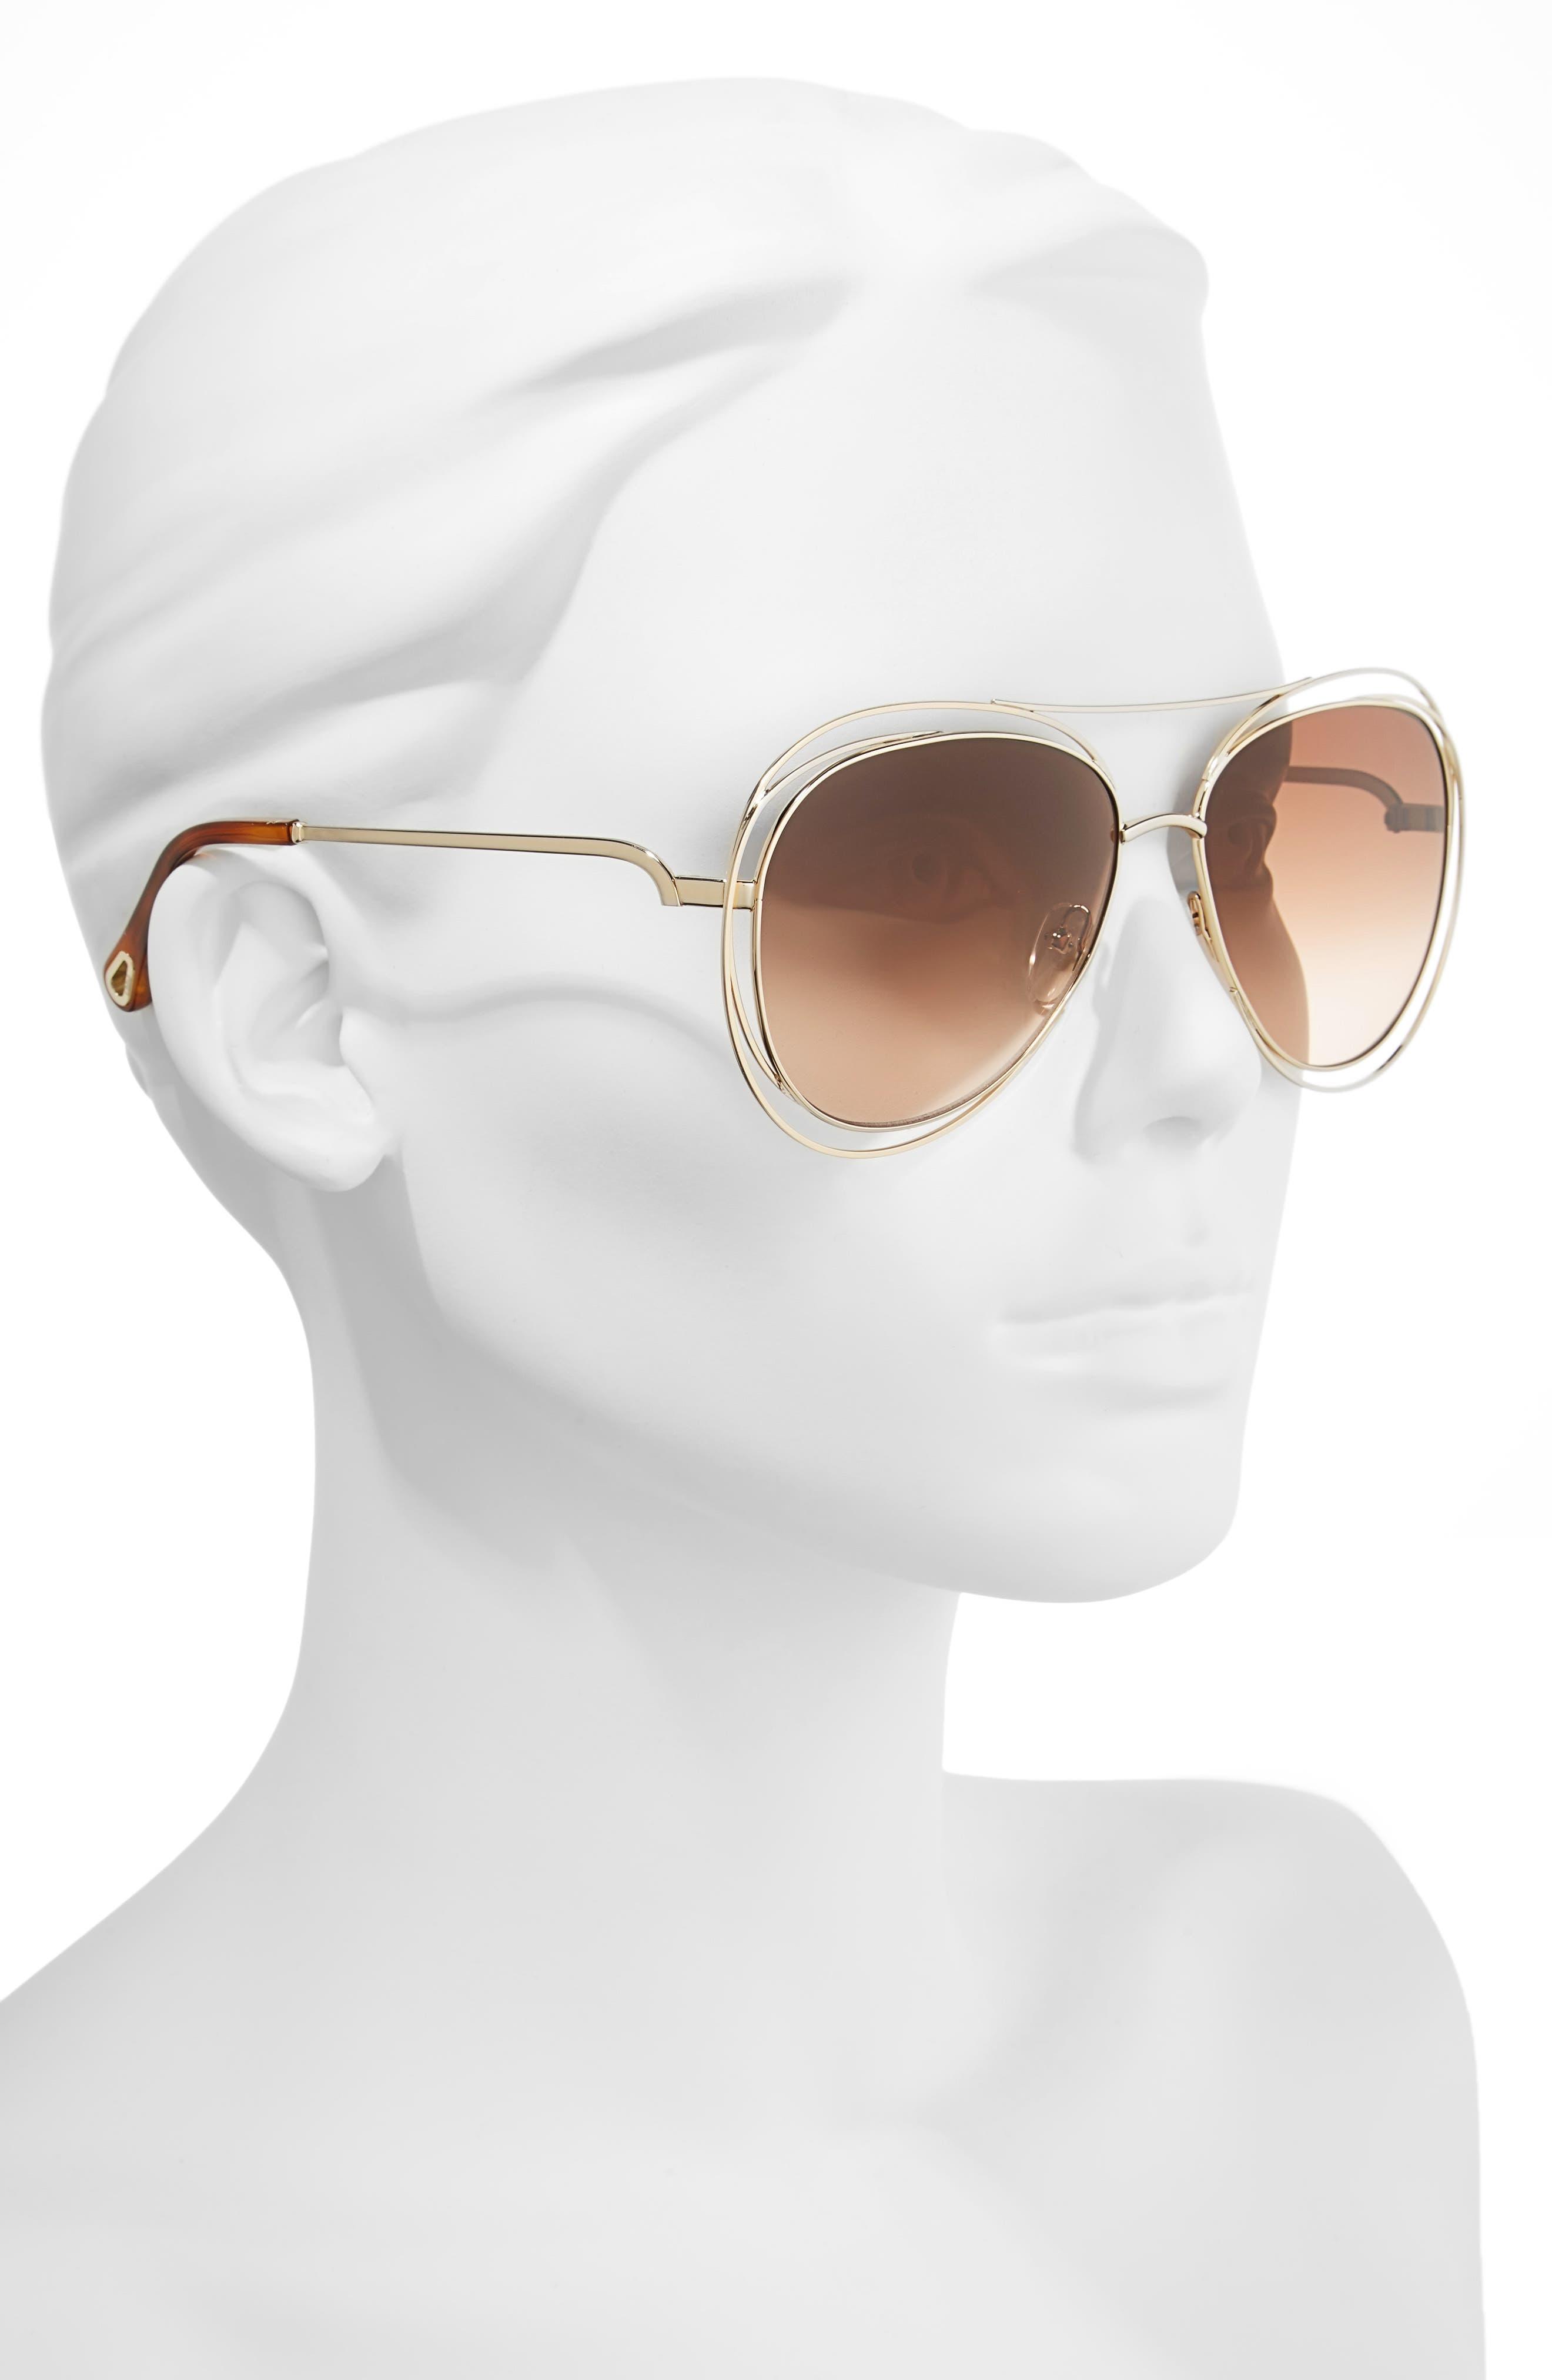 61mm Aviator Sunglasses,                             Alternate thumbnail 2, color,                             Gold/ Havana